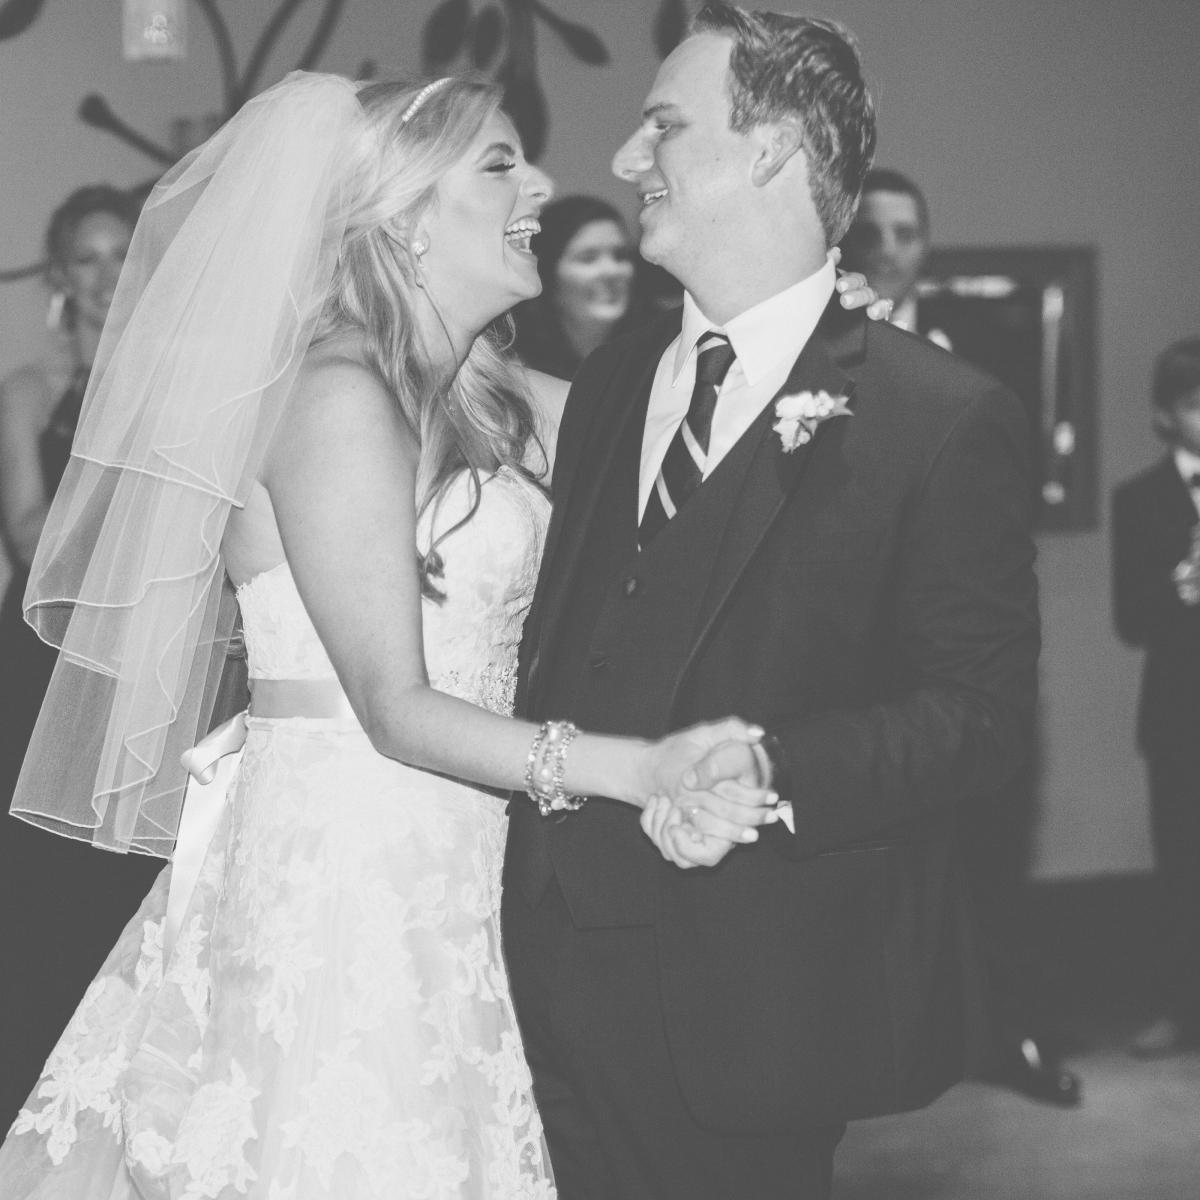 Kranz wedding, dancing